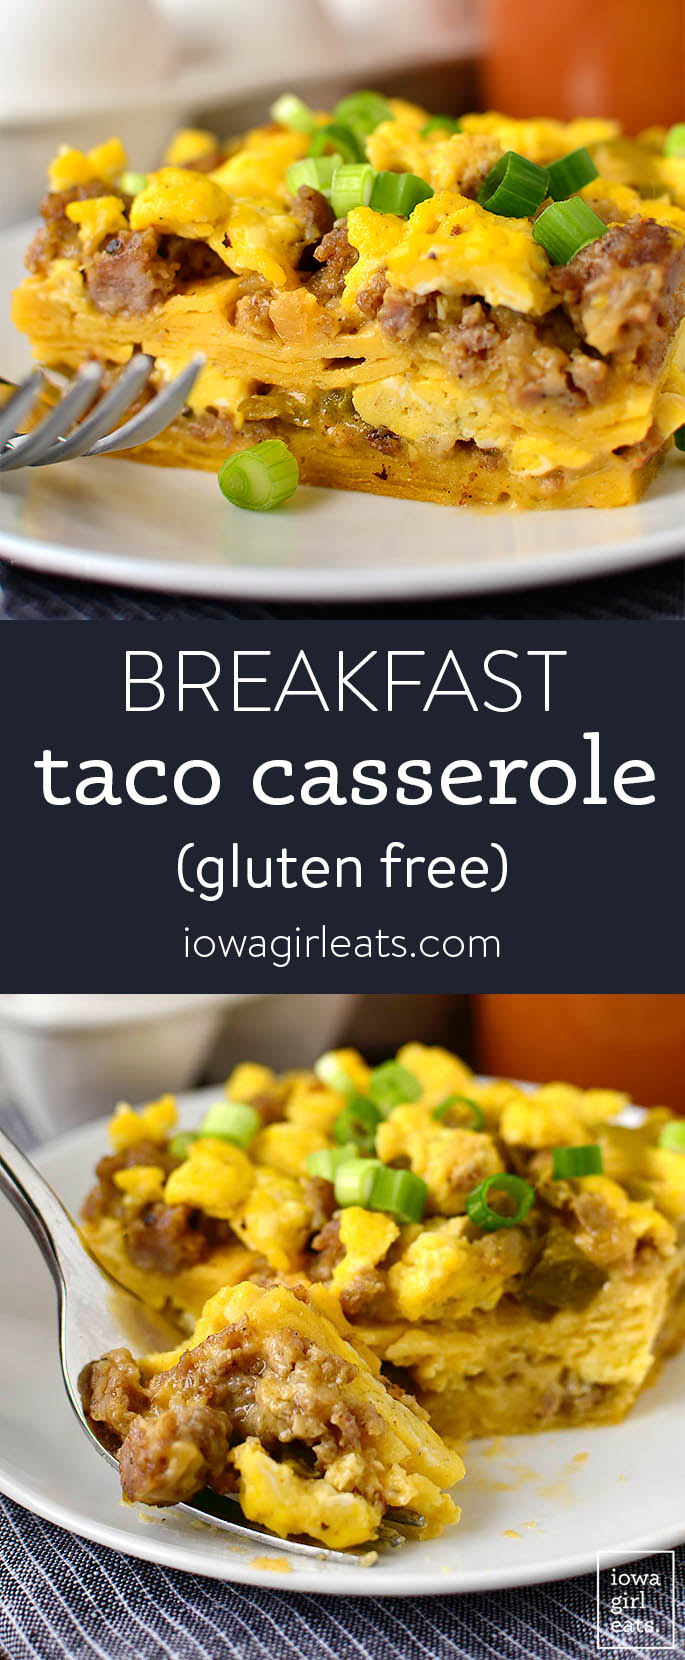 Photo collage of breakfast taco casserole